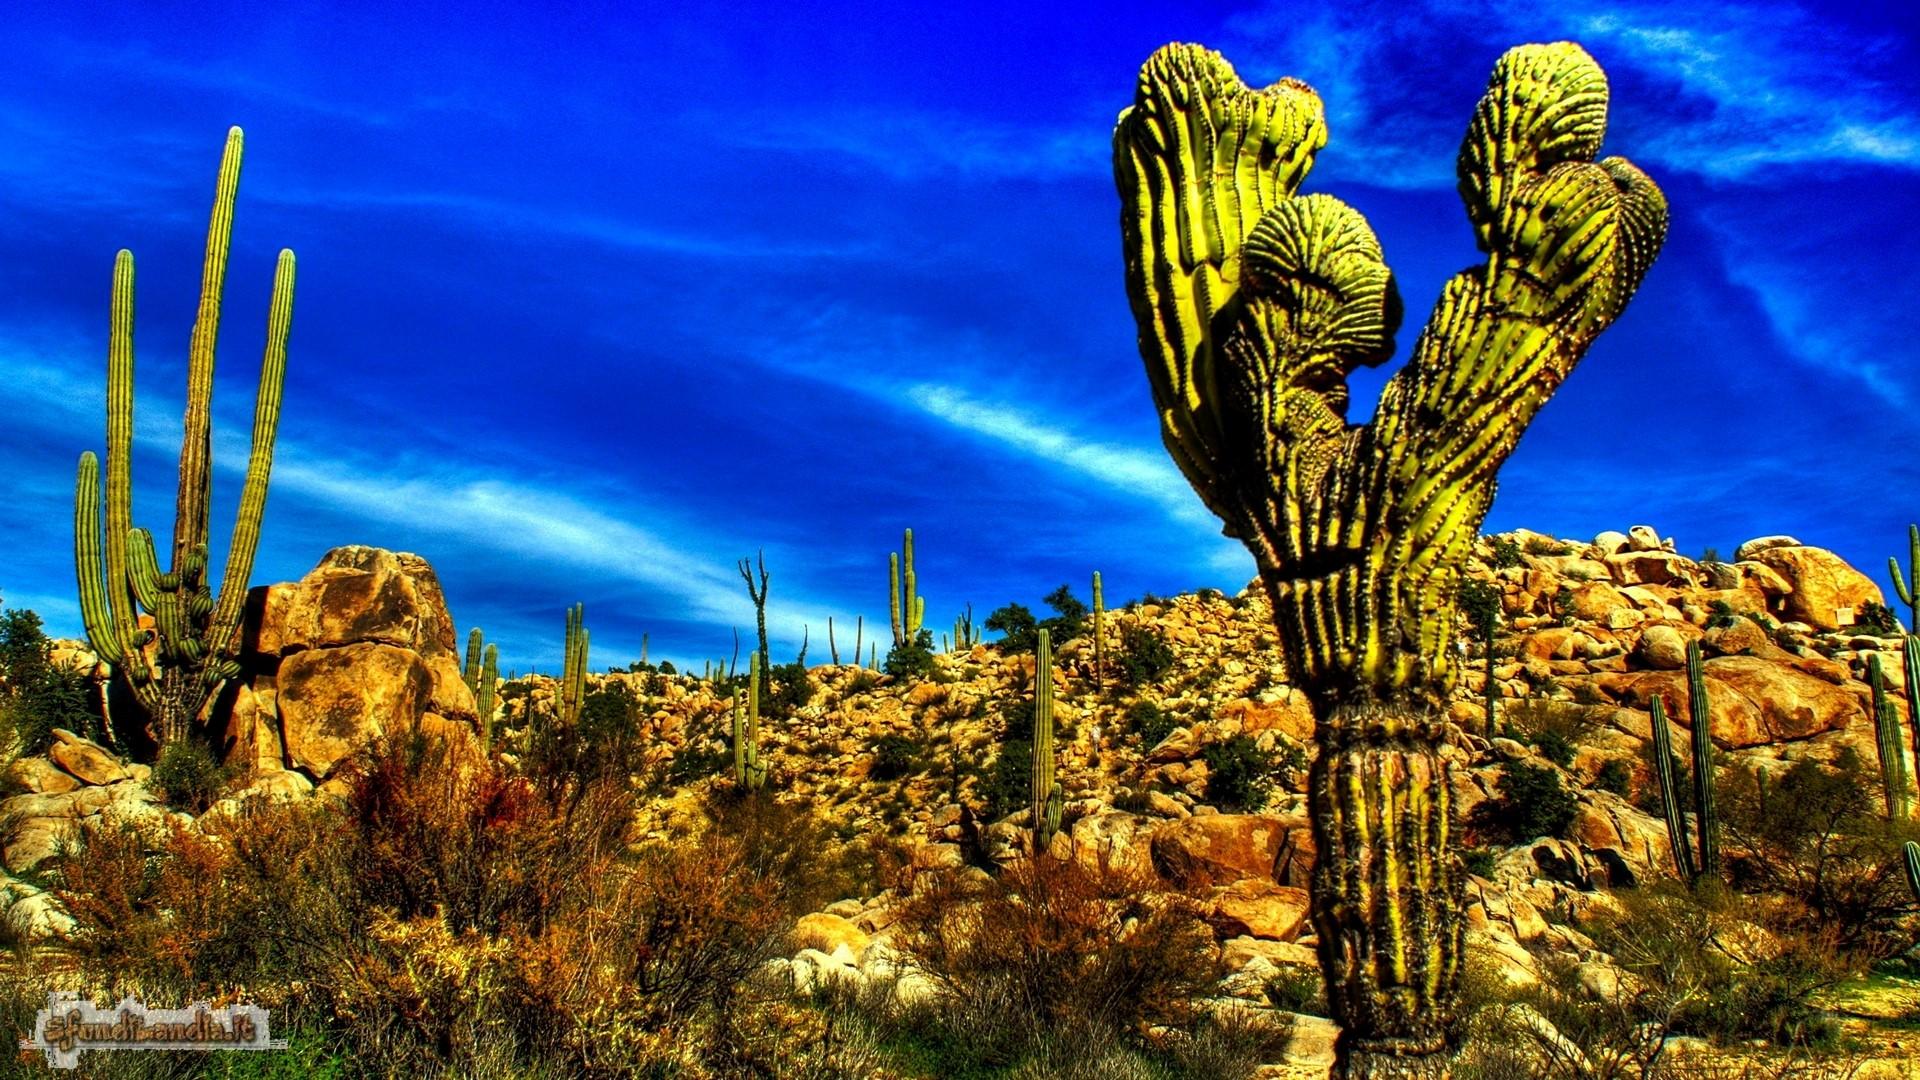 Azalai Baja Cactus